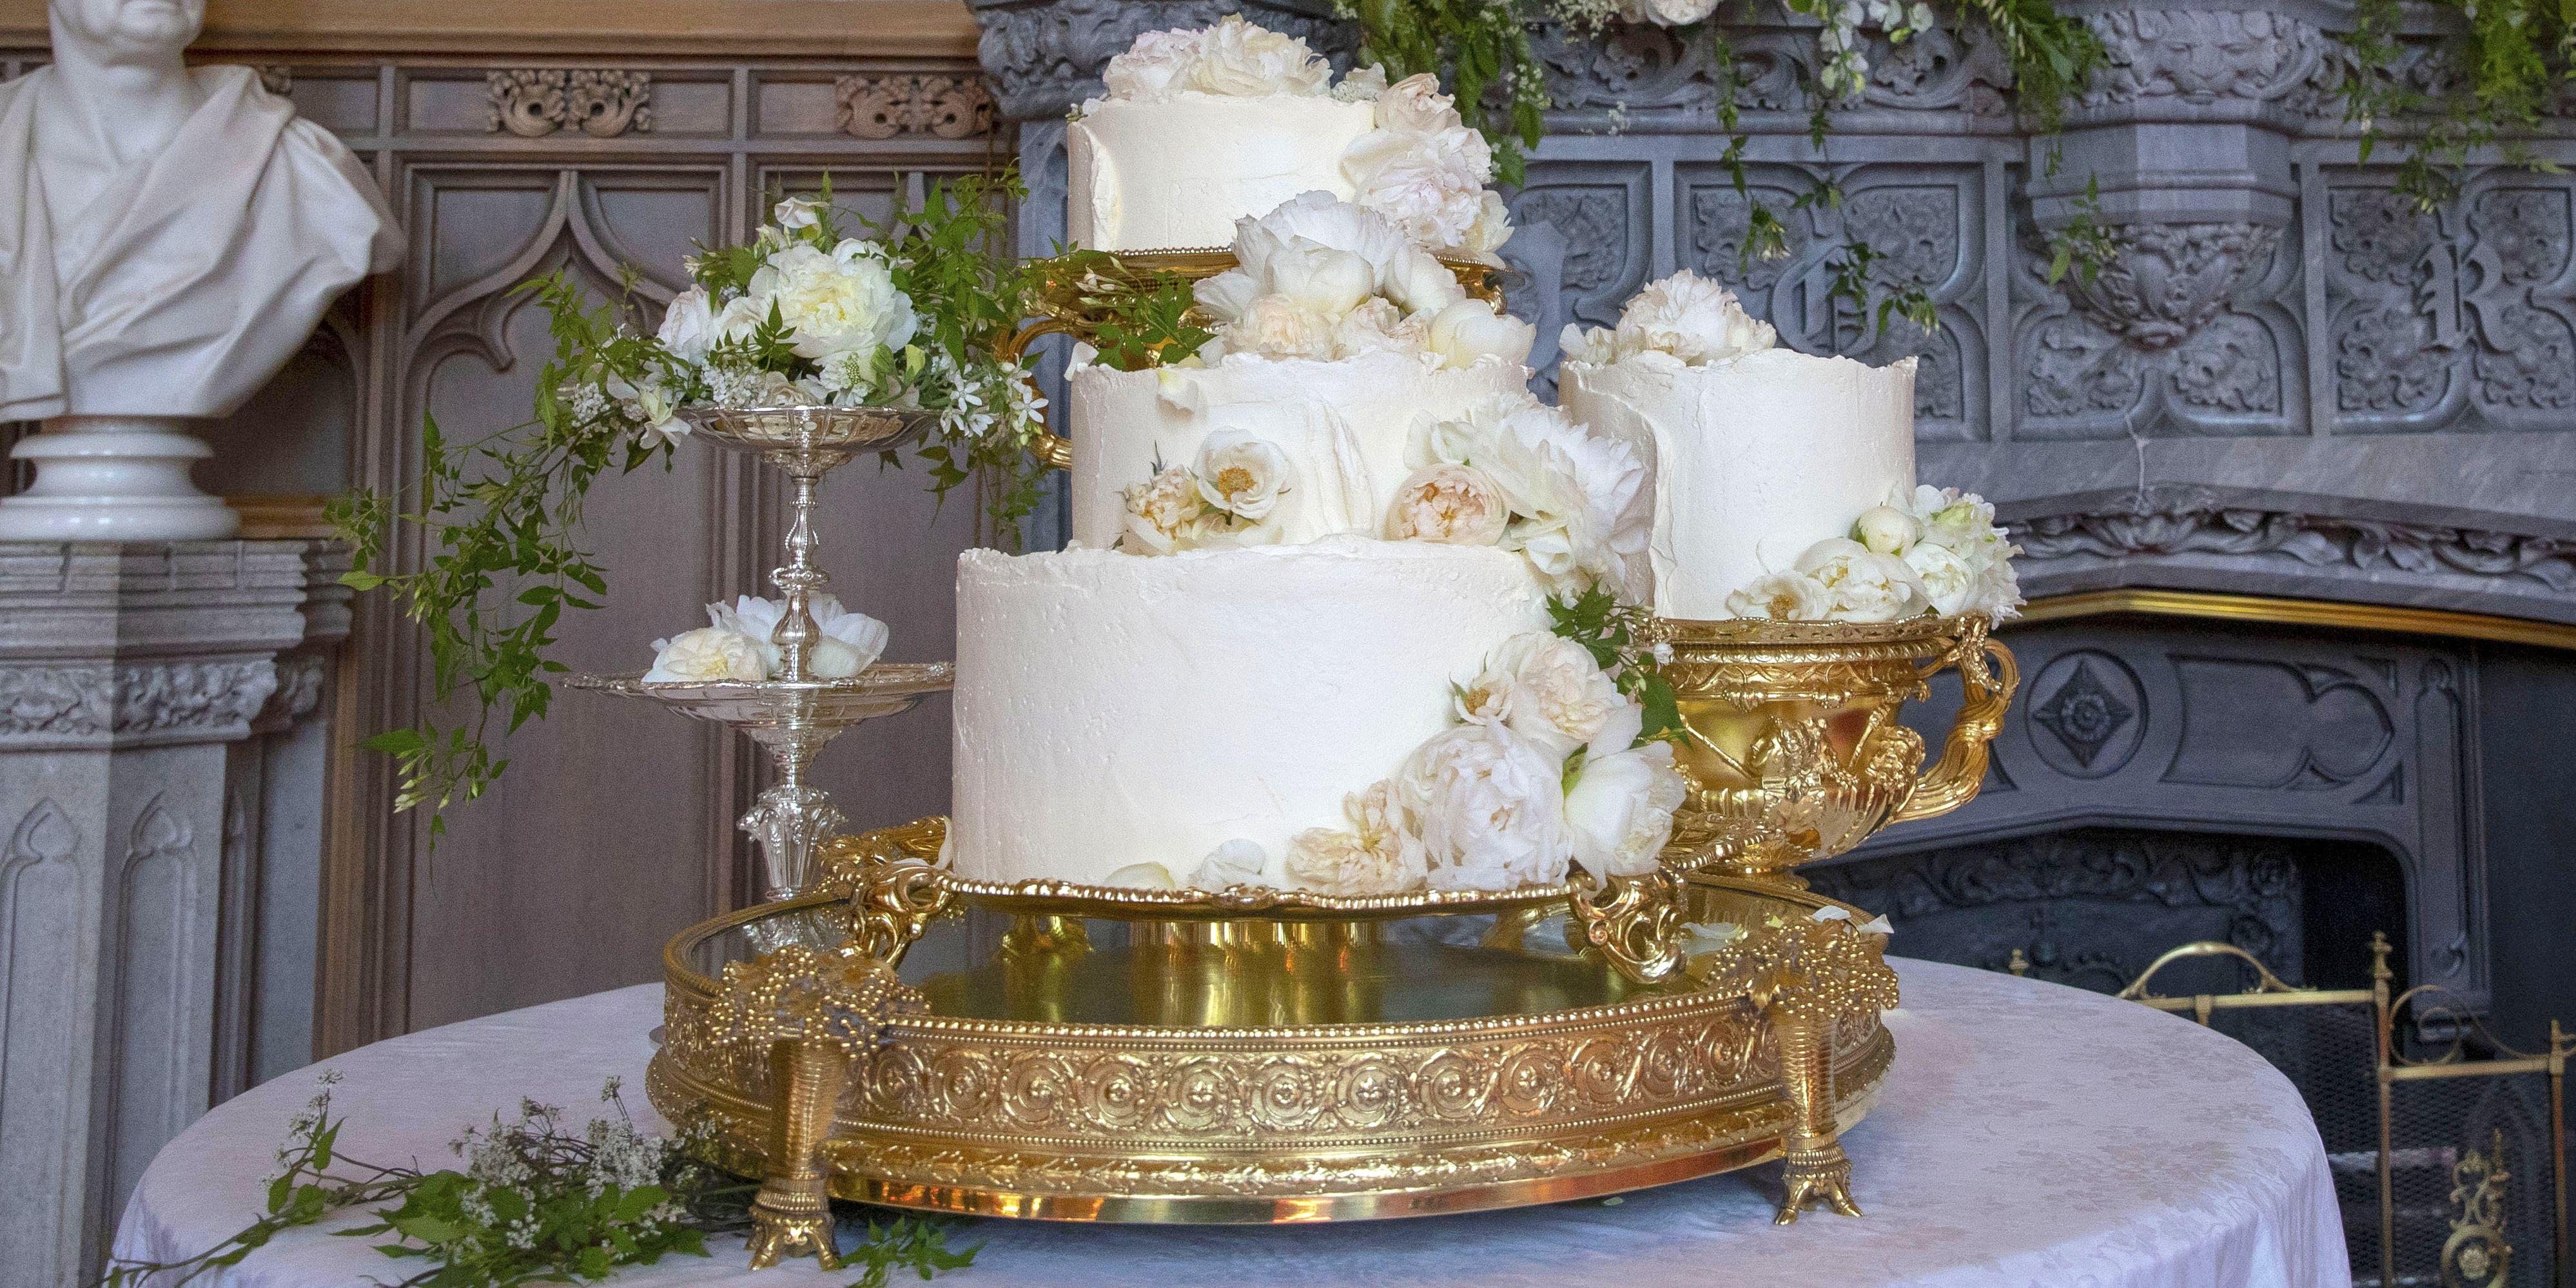 Prince Harry and Meghan Markle Wedding Cake - Who Is ...